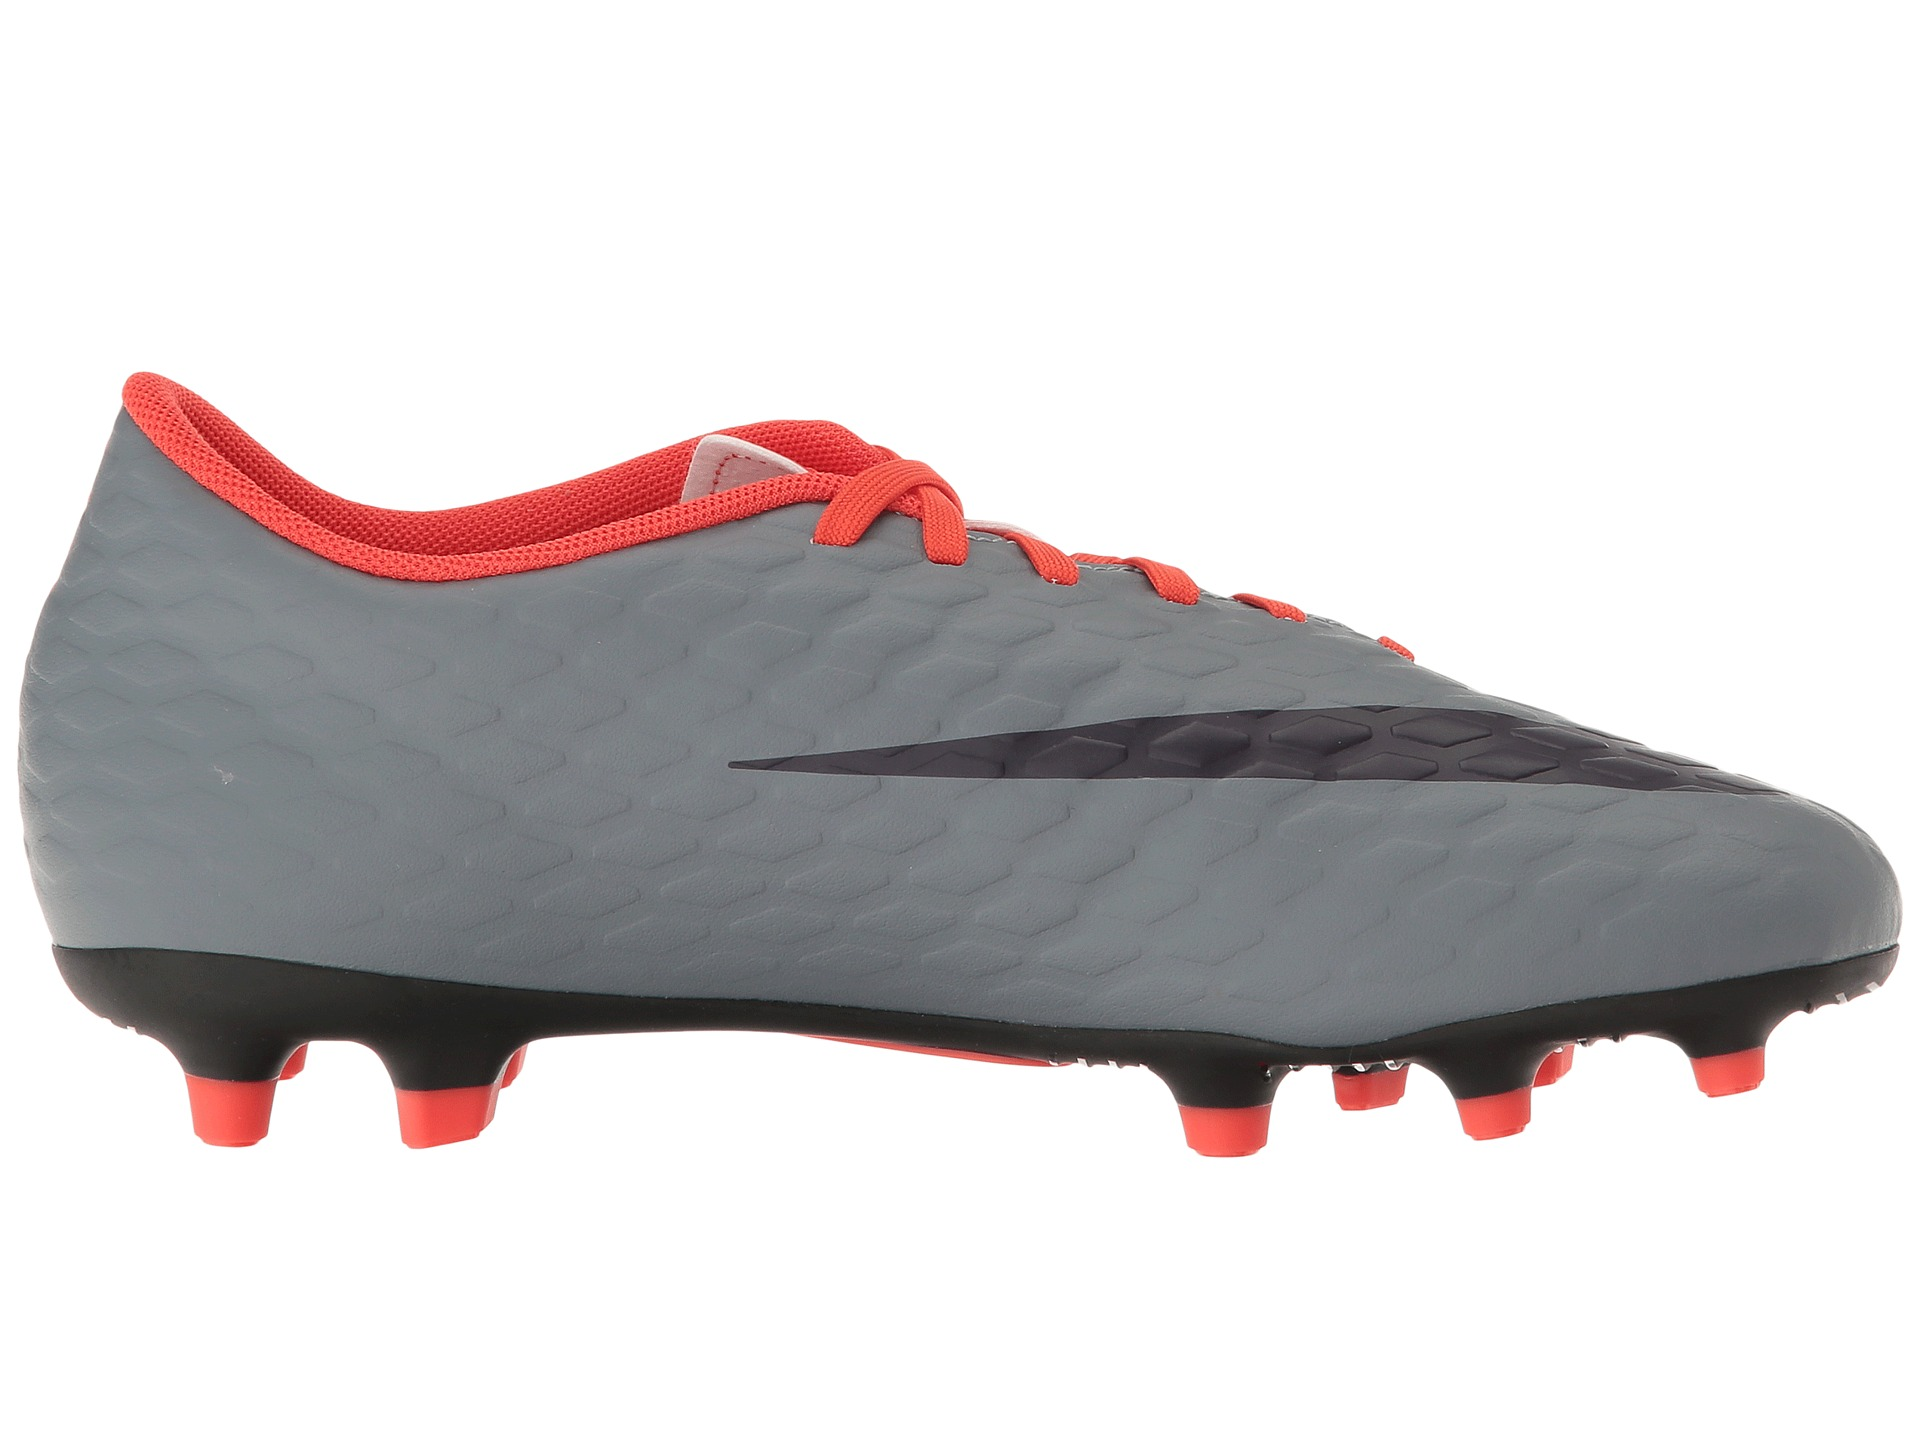 31d68df3408 Nike Flyknit Trainer Chukka Sfb Ebay Steve Madden Sparkly Sandals ...